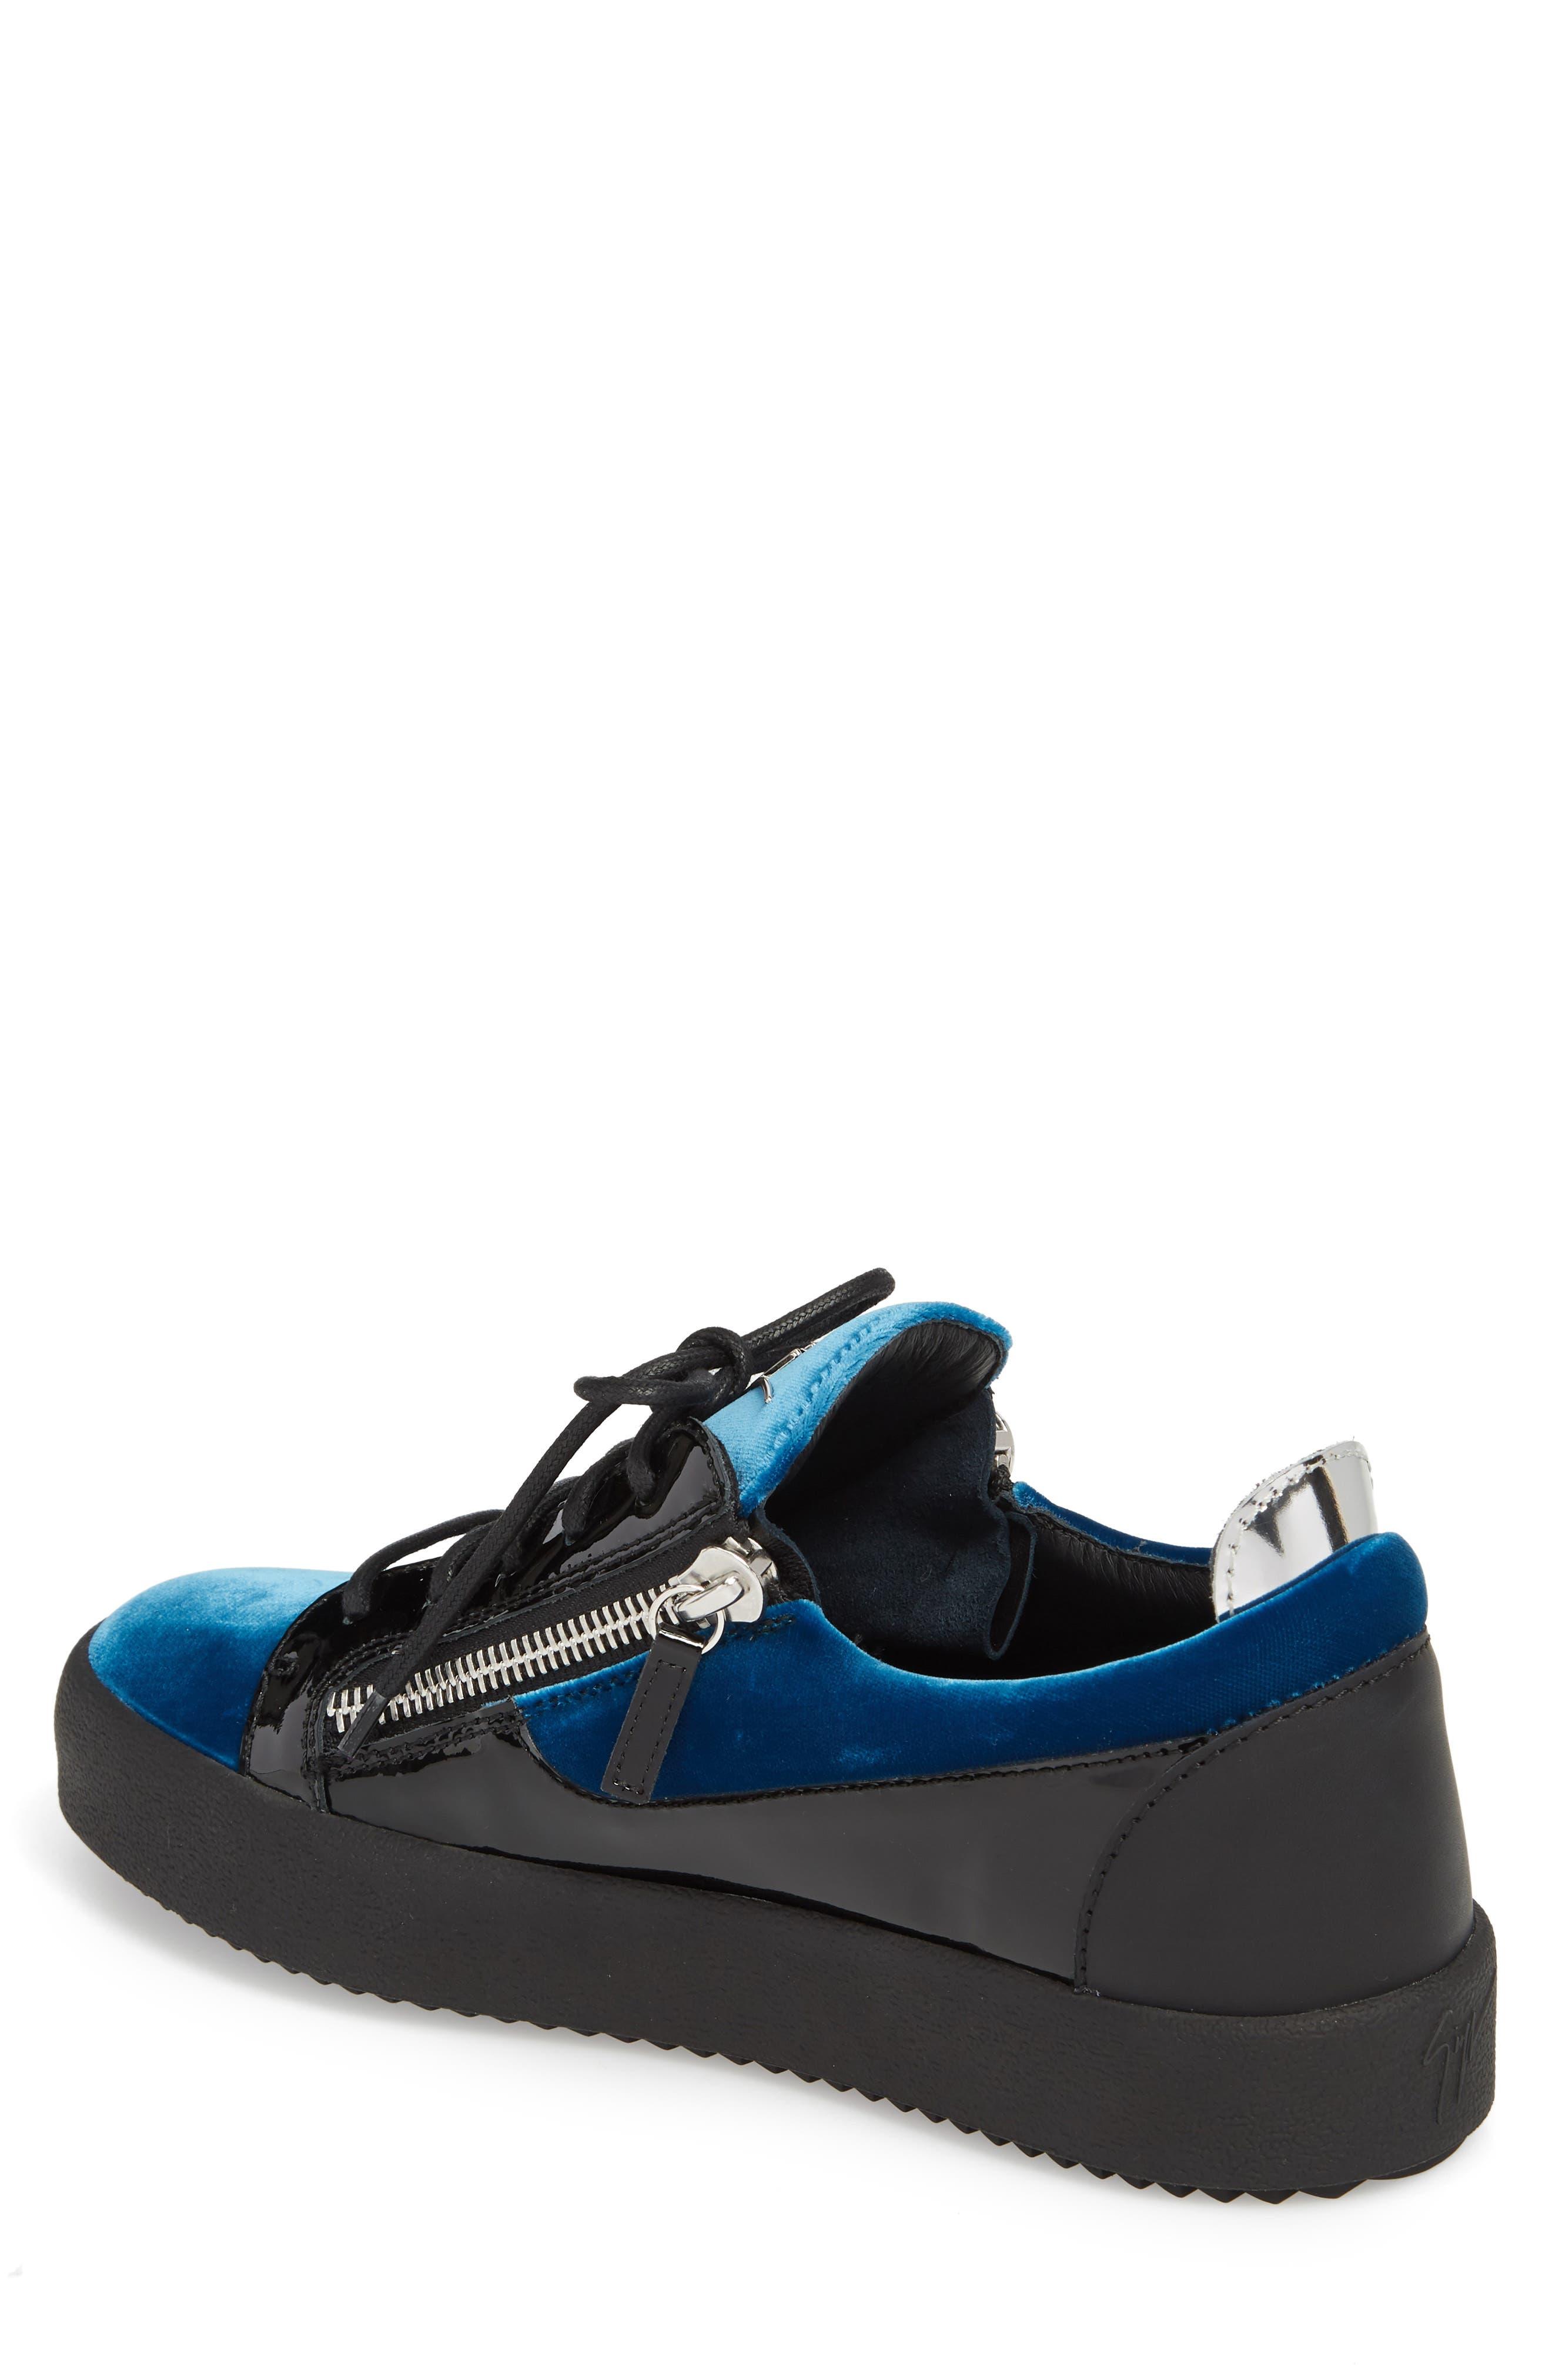 Camo Sneaker,                             Alternate thumbnail 2, color,                             BLUE